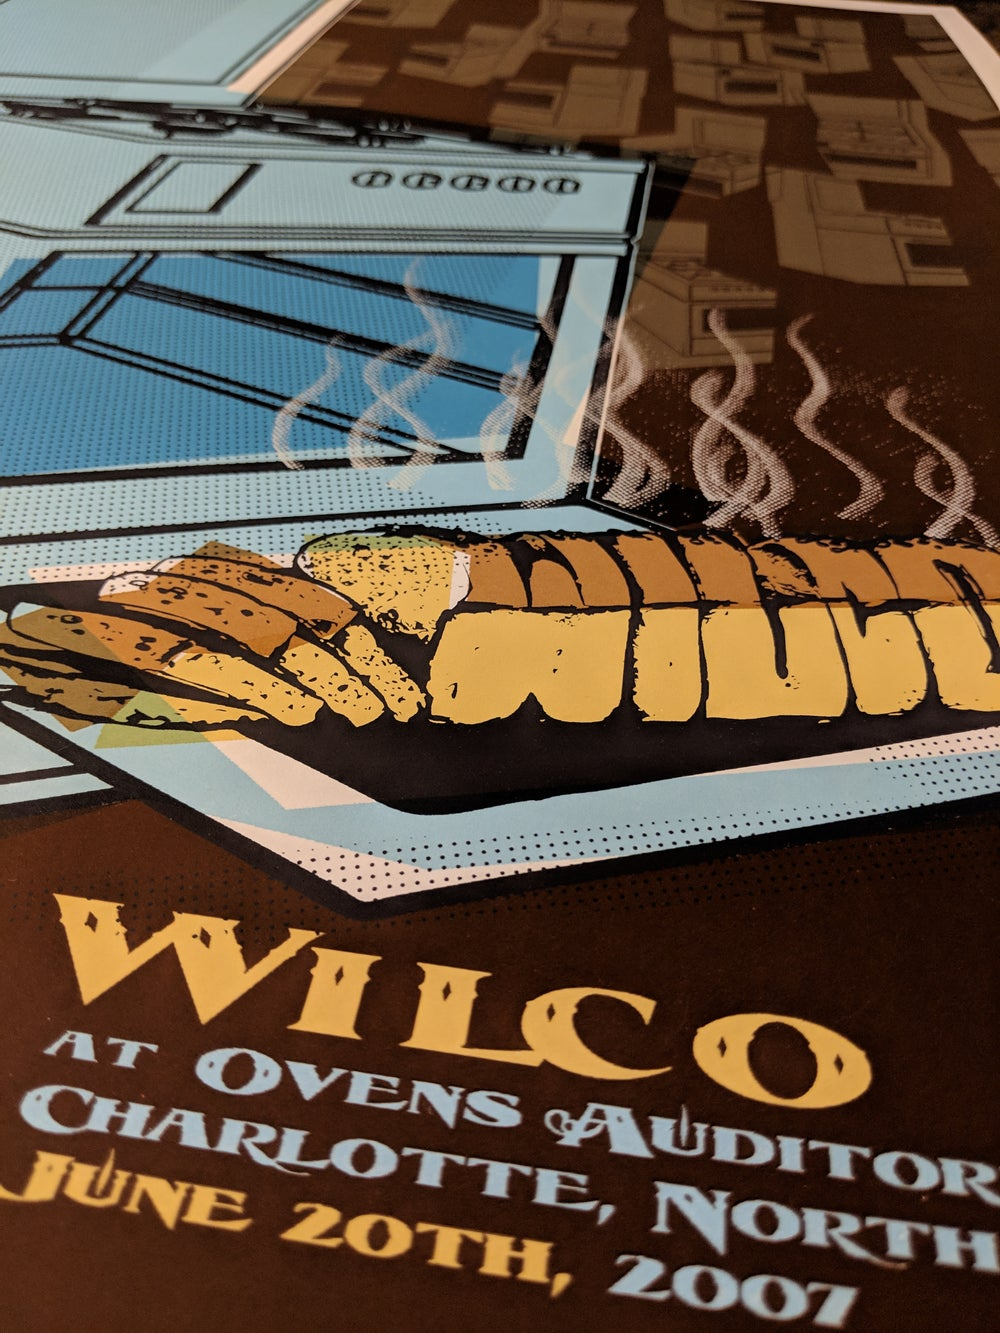 Wilco (Ovens) Charlotte, NC **RARE**